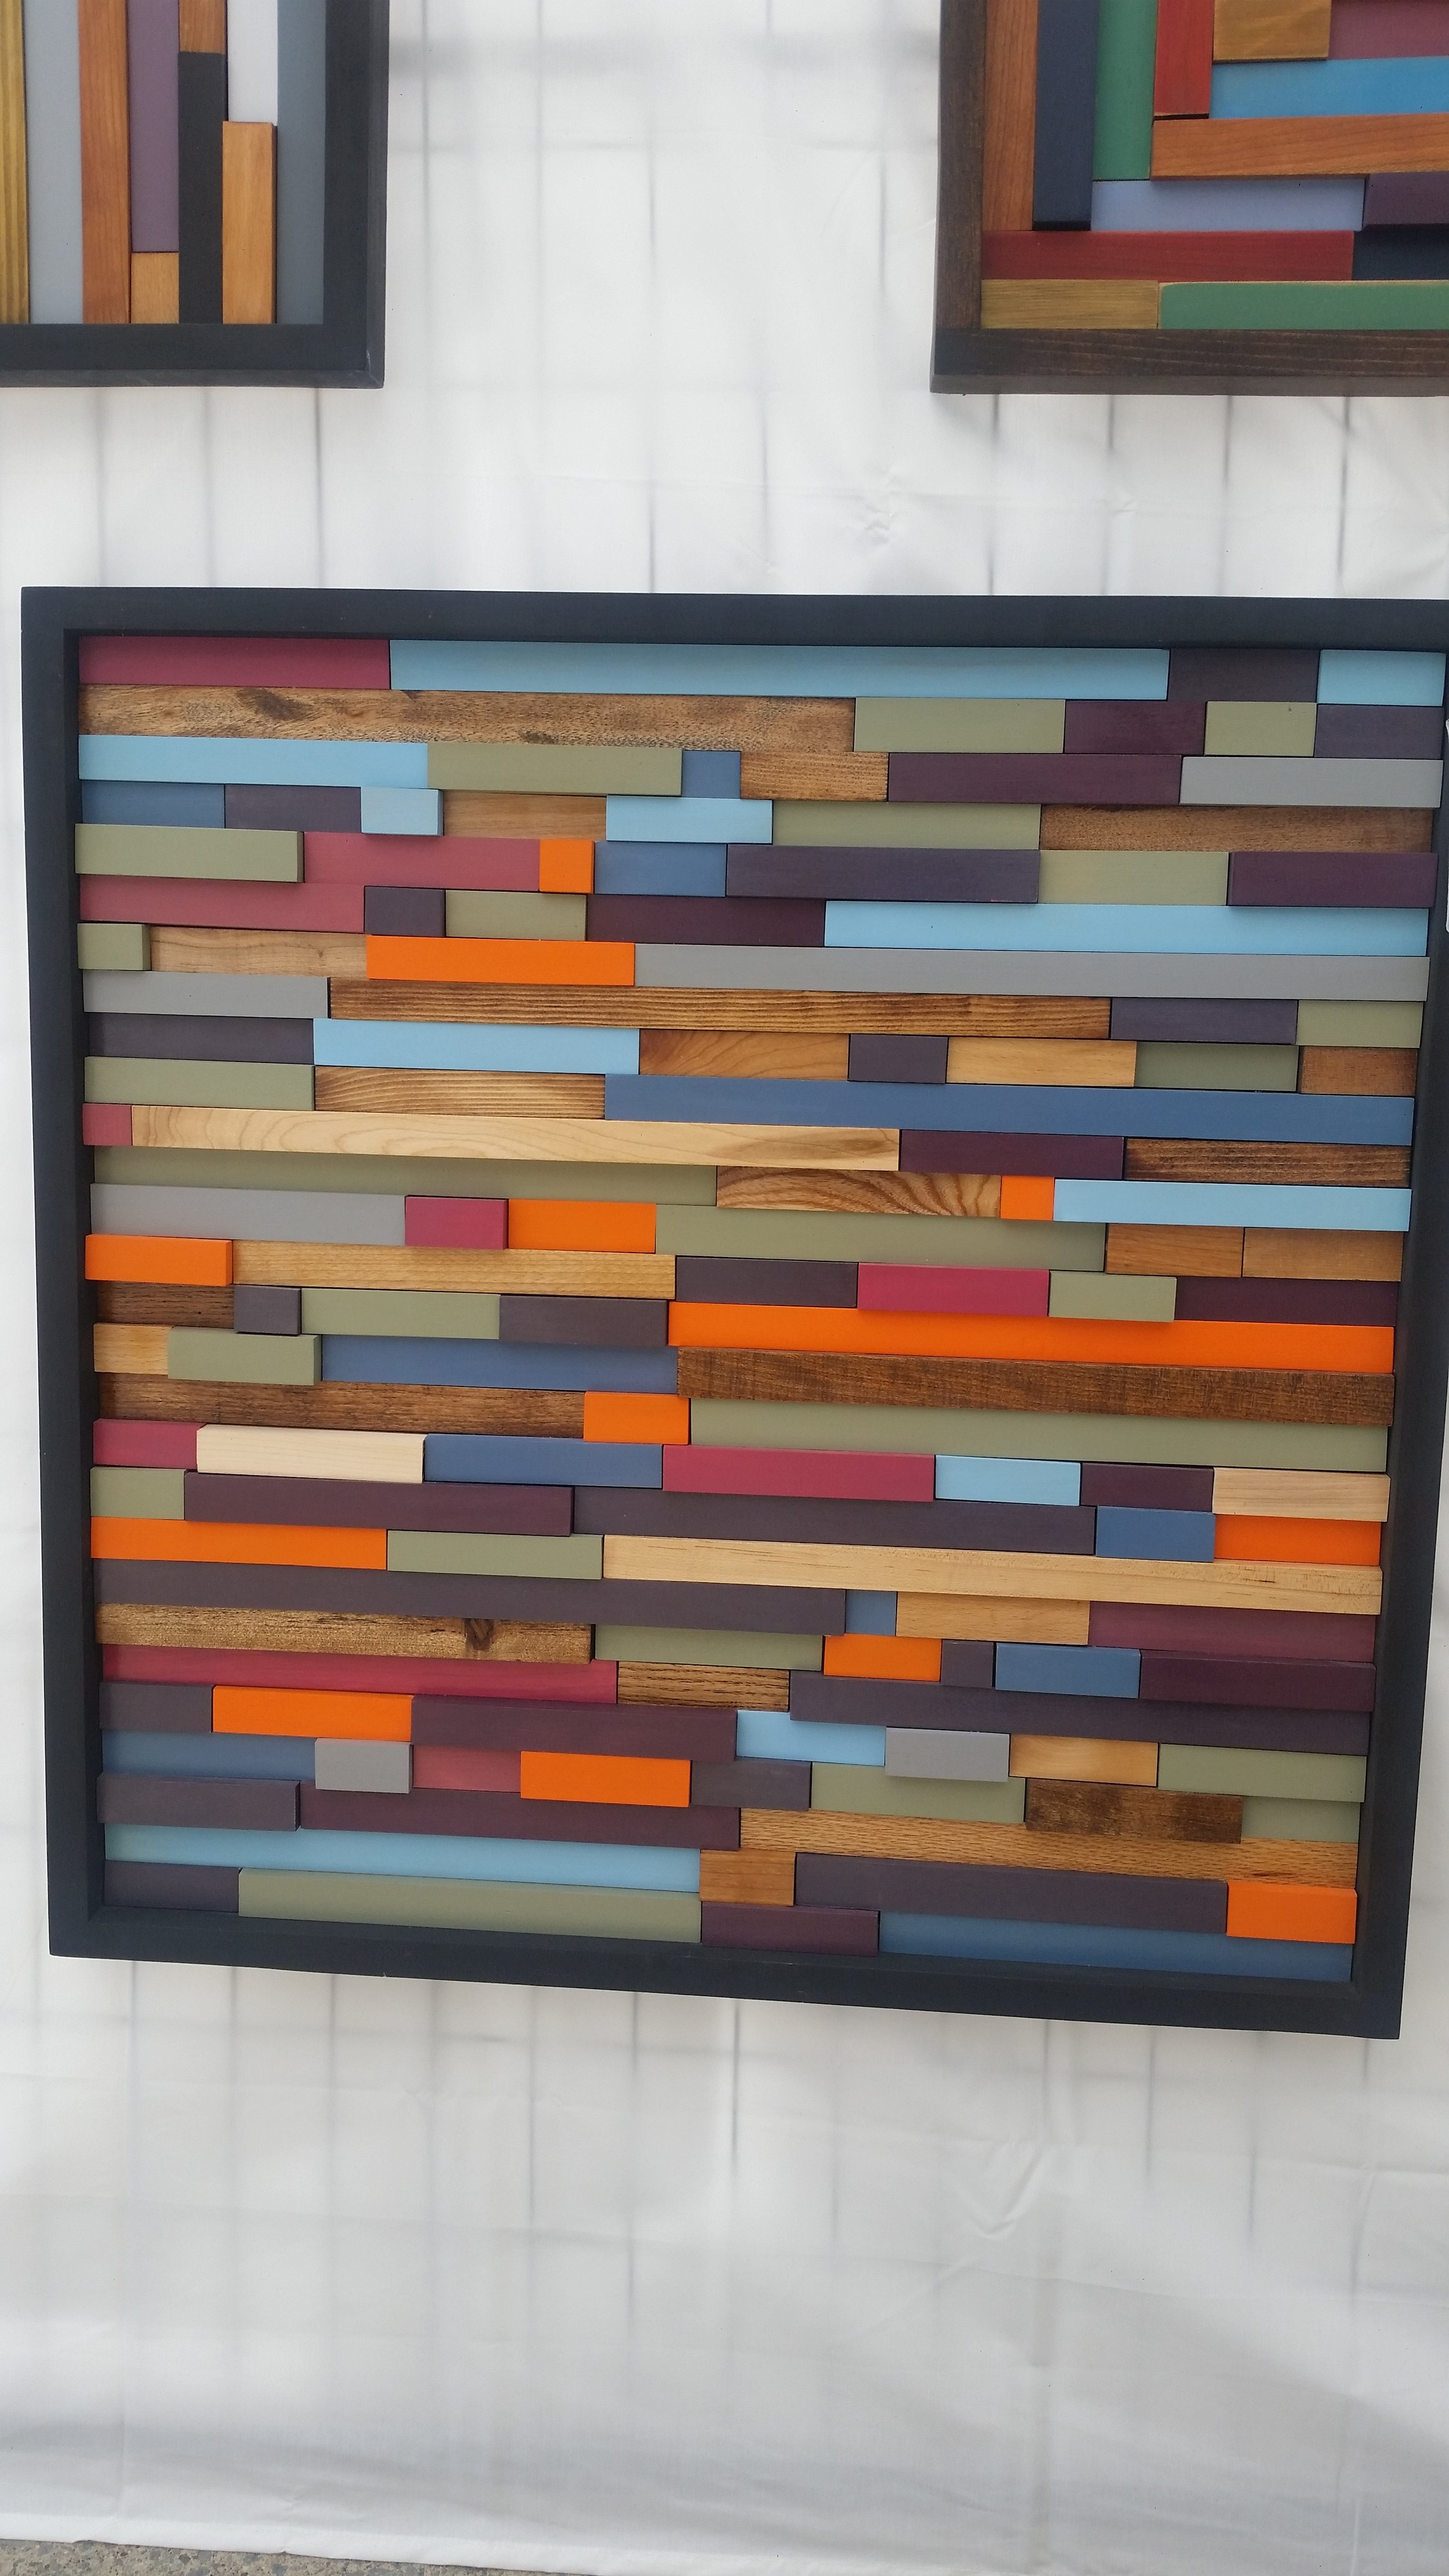 Work by Valerie Queen/Wood Art Boutique